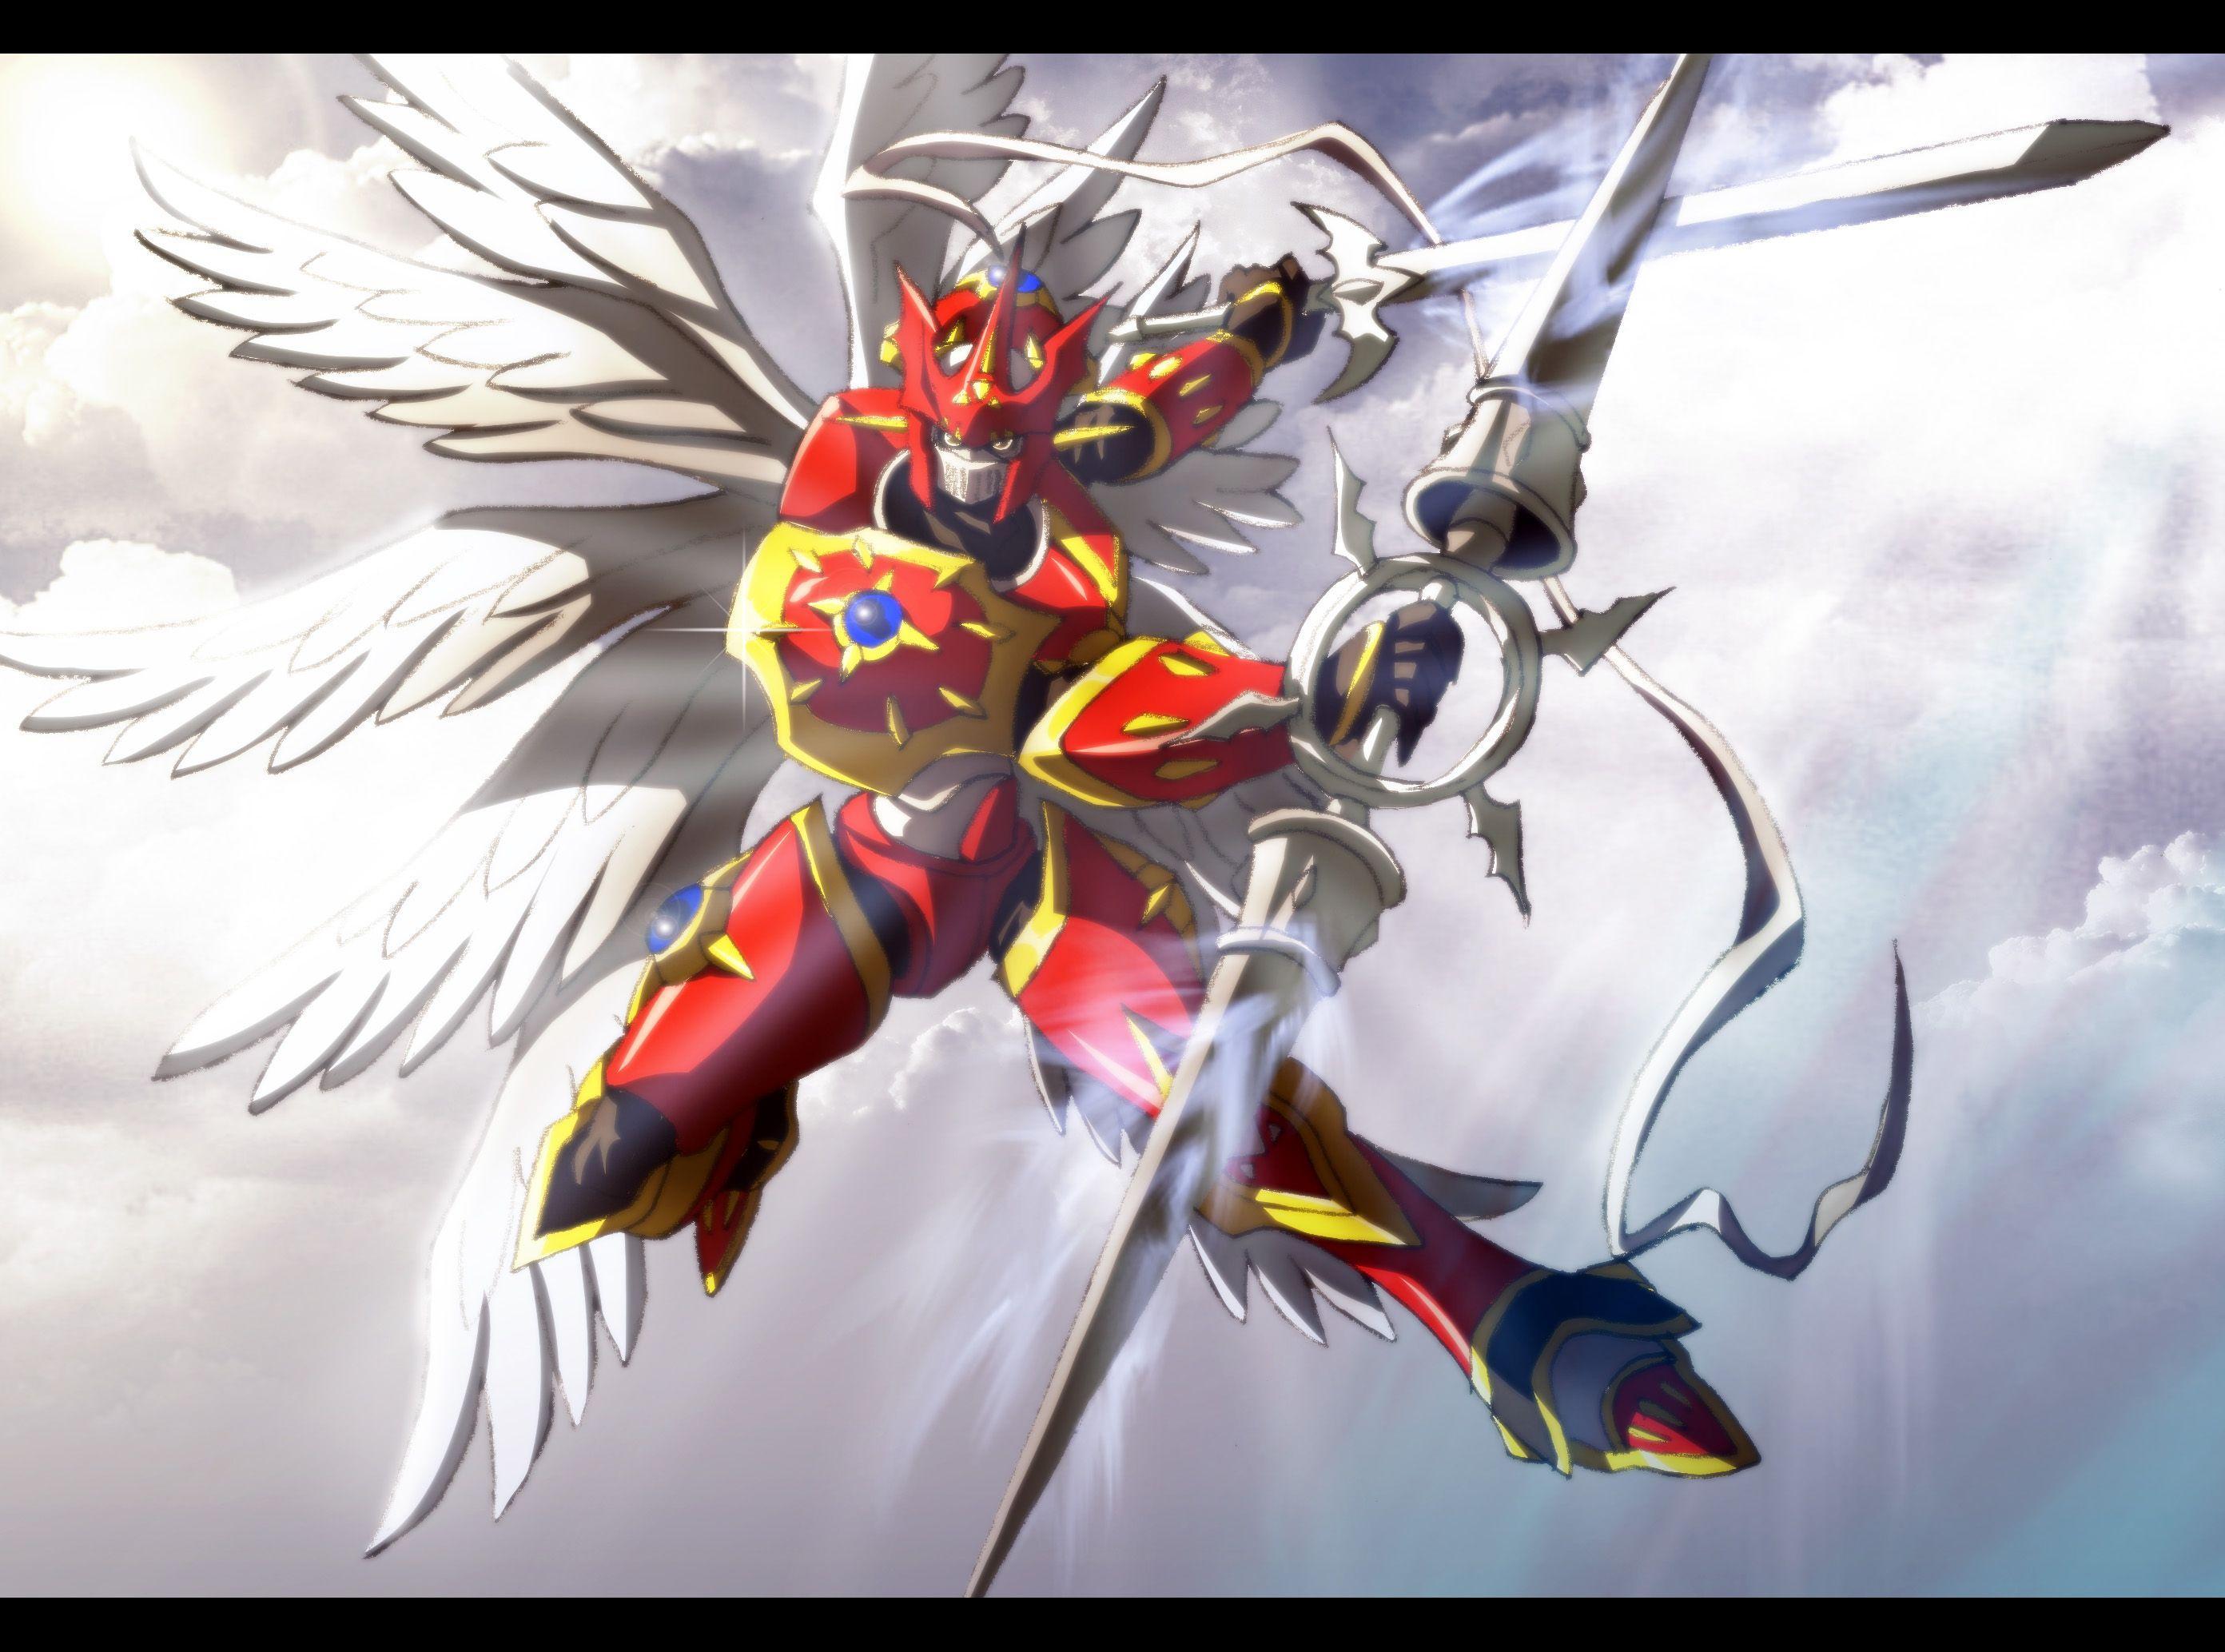 Digimon Wallpapers - Top Free Digimon